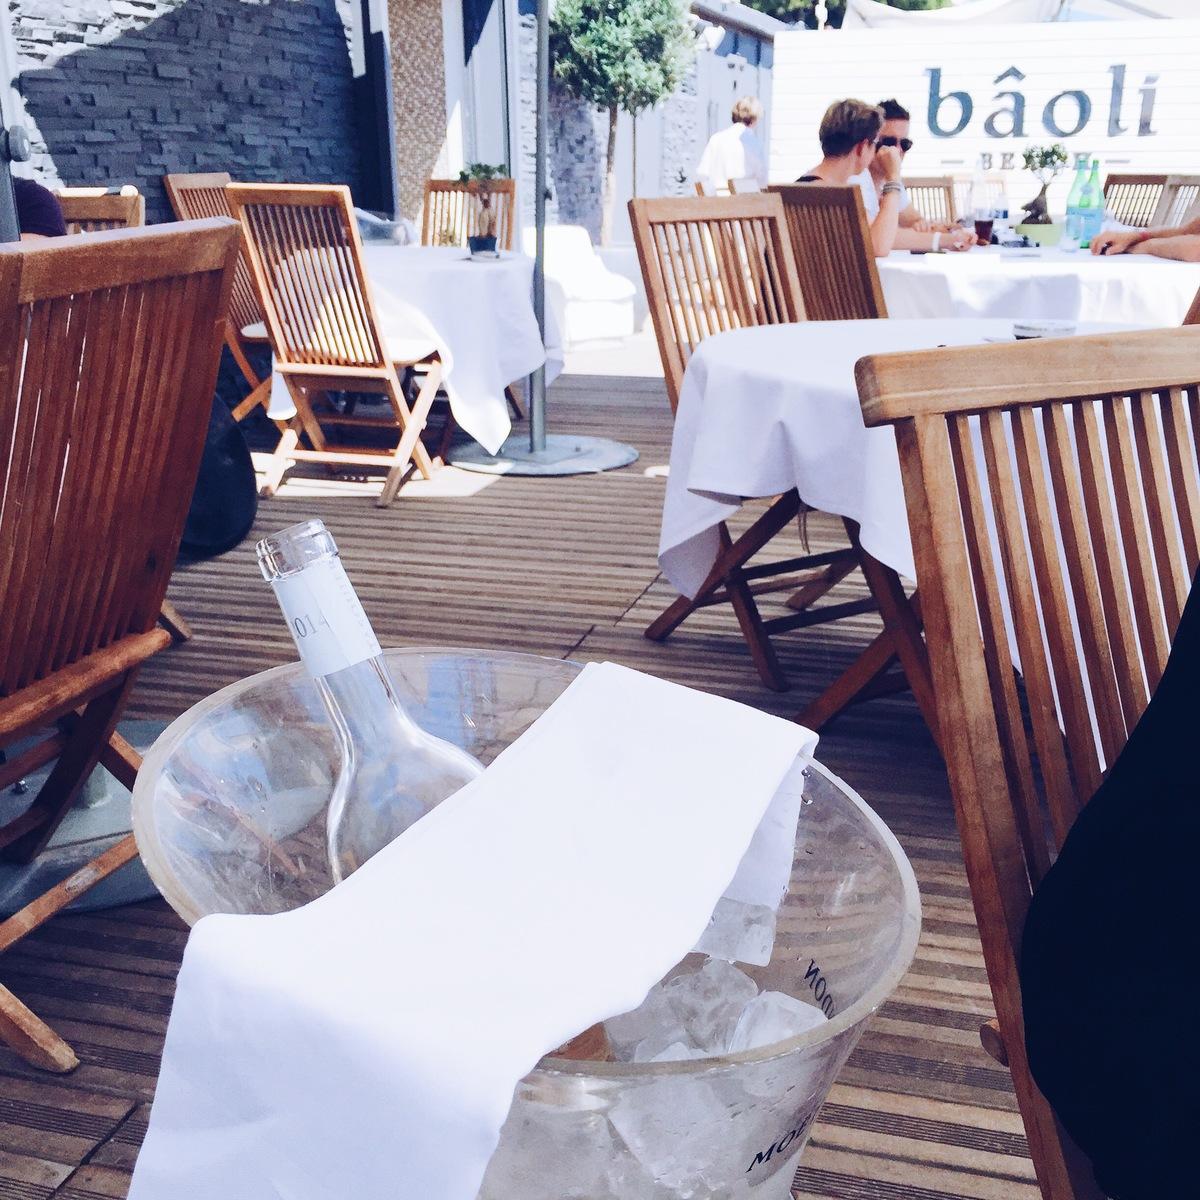 Baoli Beach Cannes